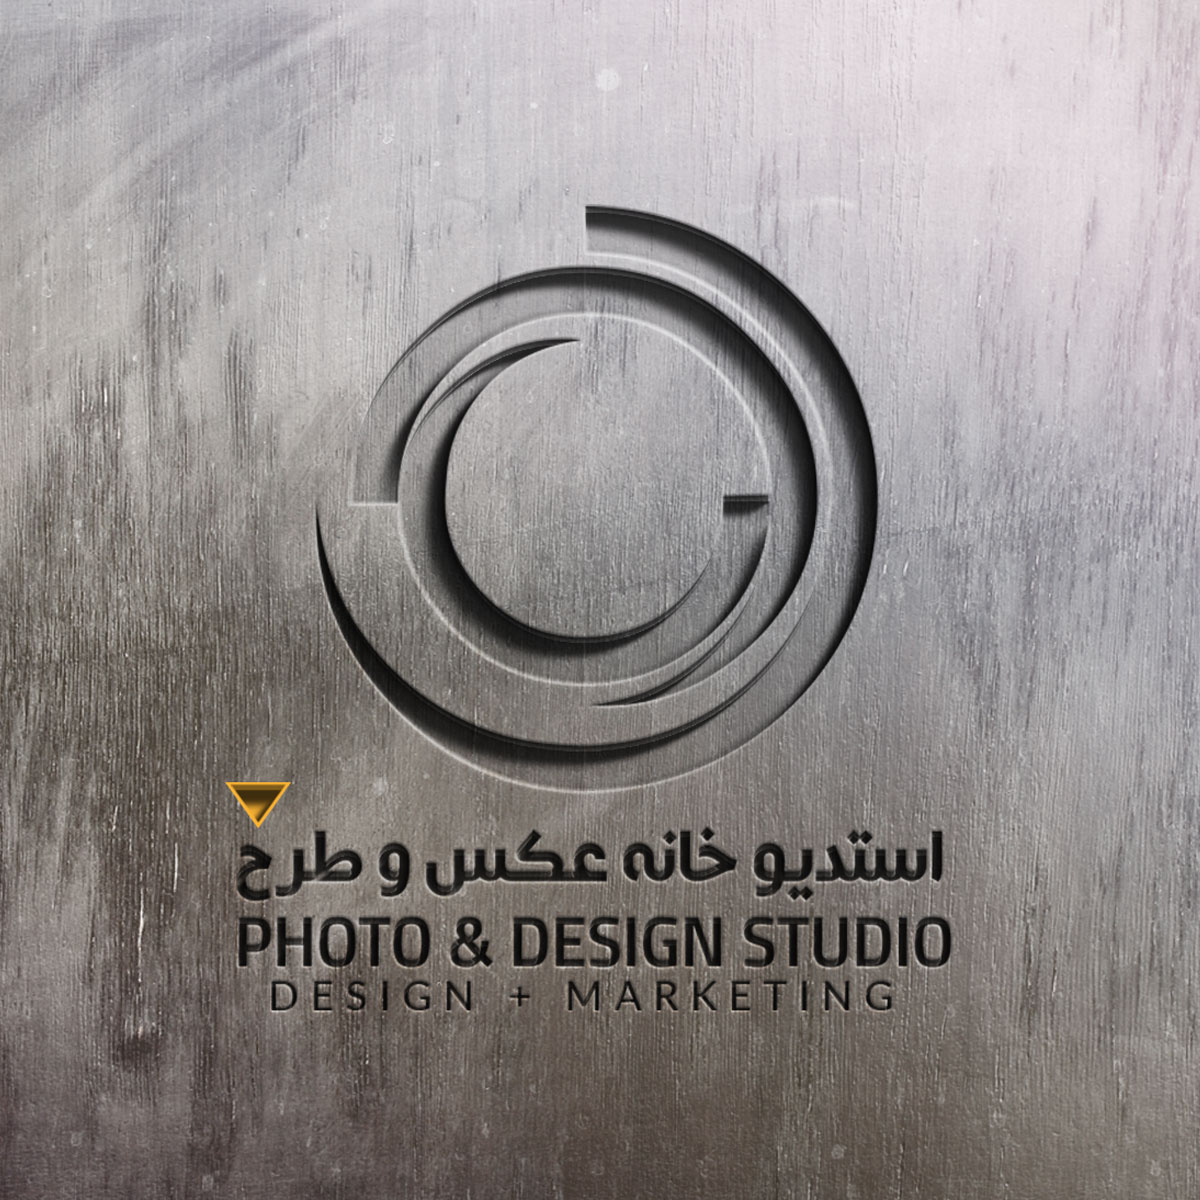 PHOTO & DESIGN studio | PDS™ LOGO